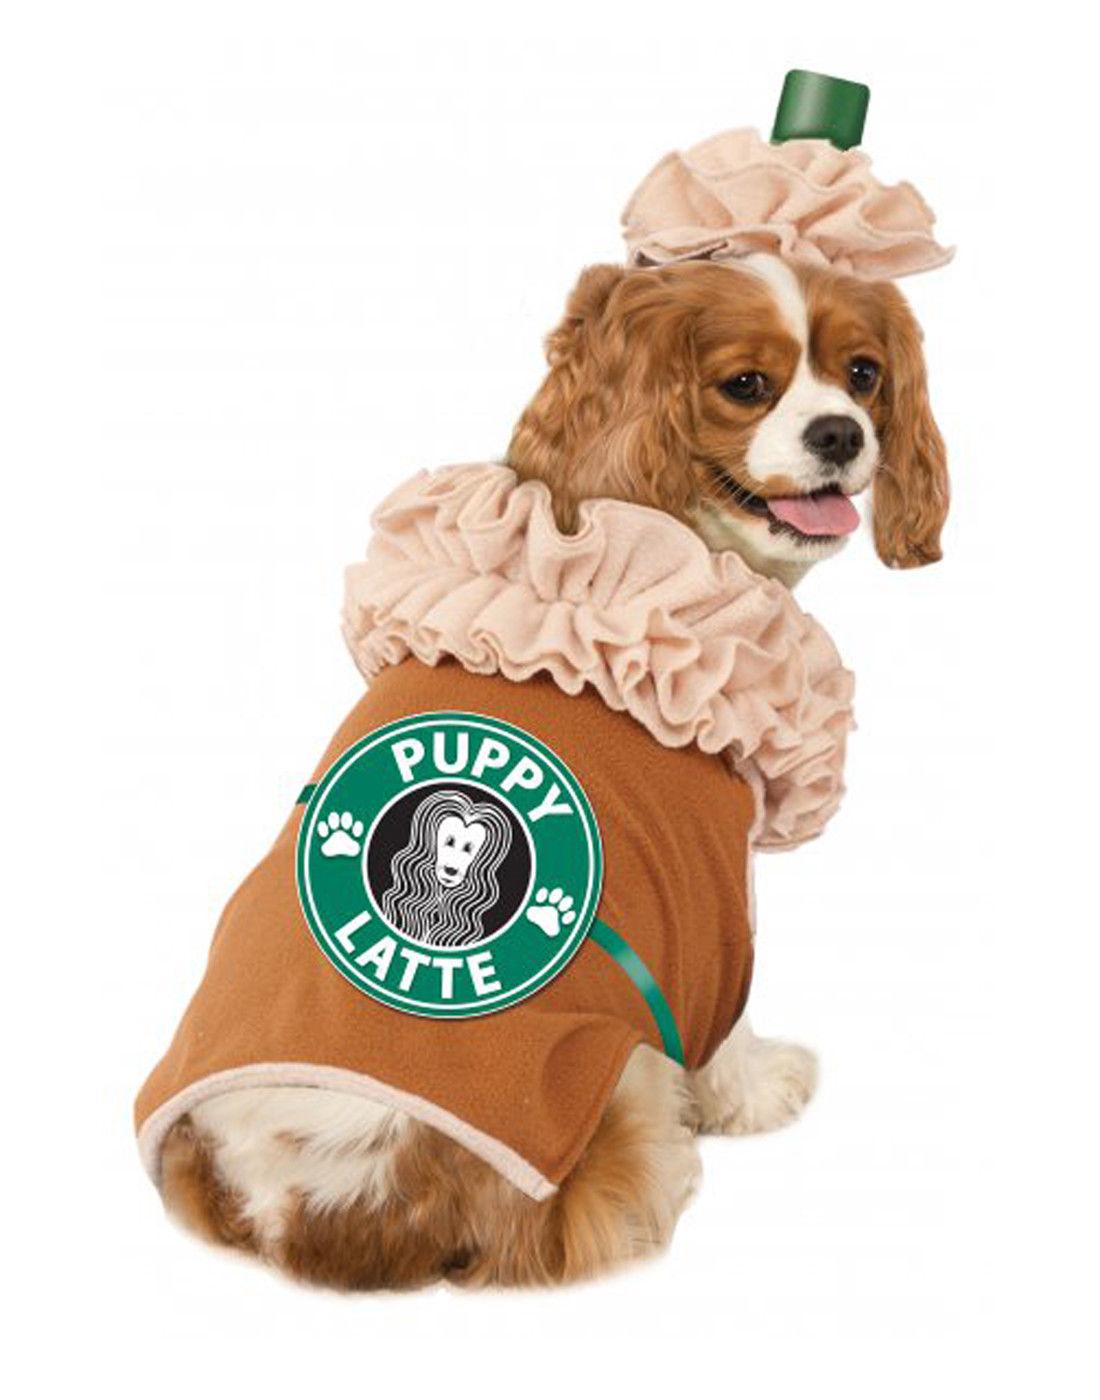 12 92 Pet Costume Puppy Latte Starbucks Frappuccino Dog Cat